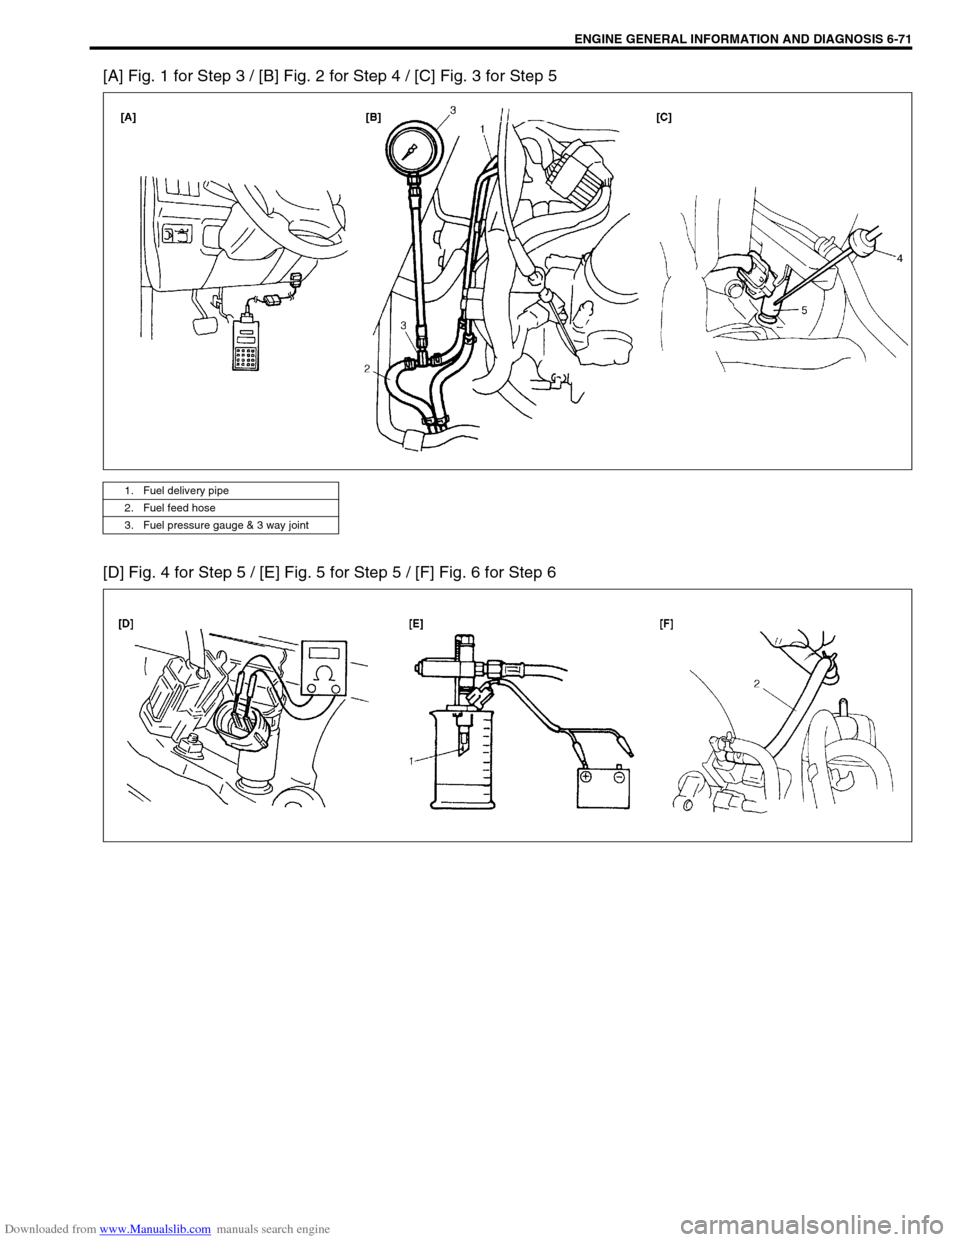 Suzuki Jimny 2005 3g Service Workshop Manual 427 Engine Diagram G Page 428